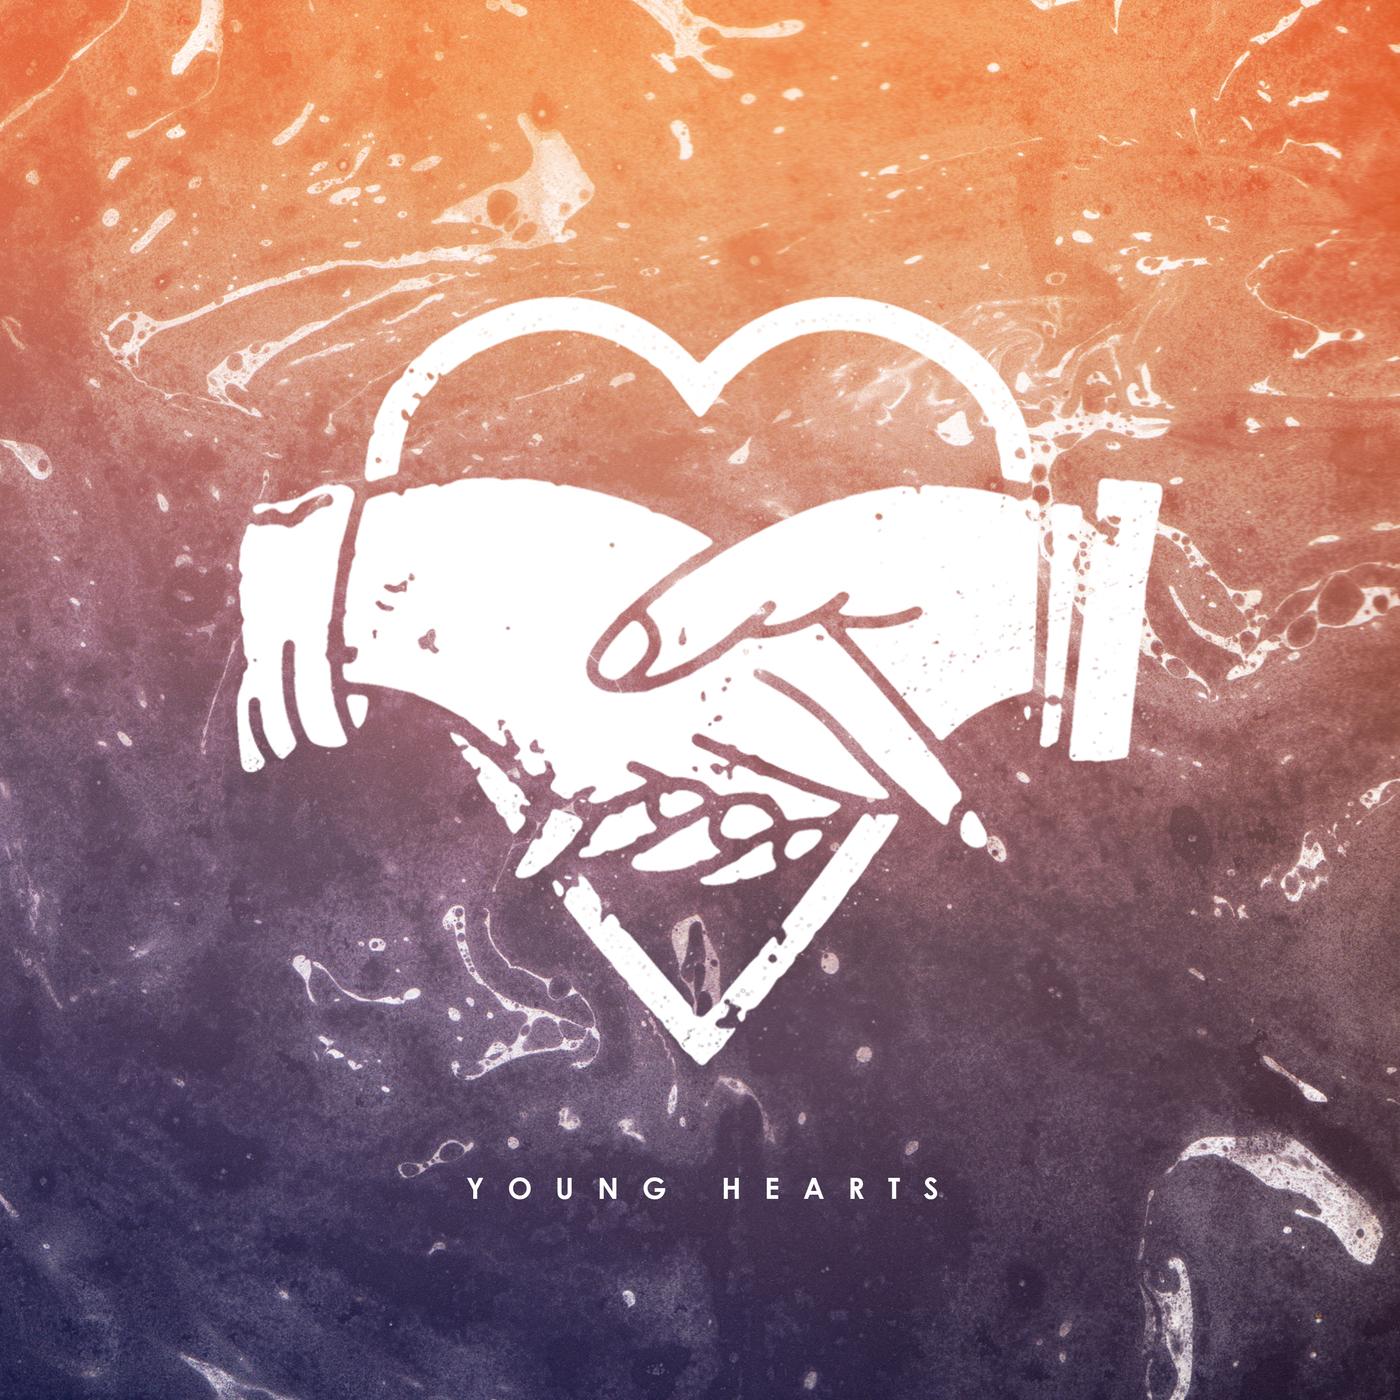 Omaha - Young Hearts (2016)